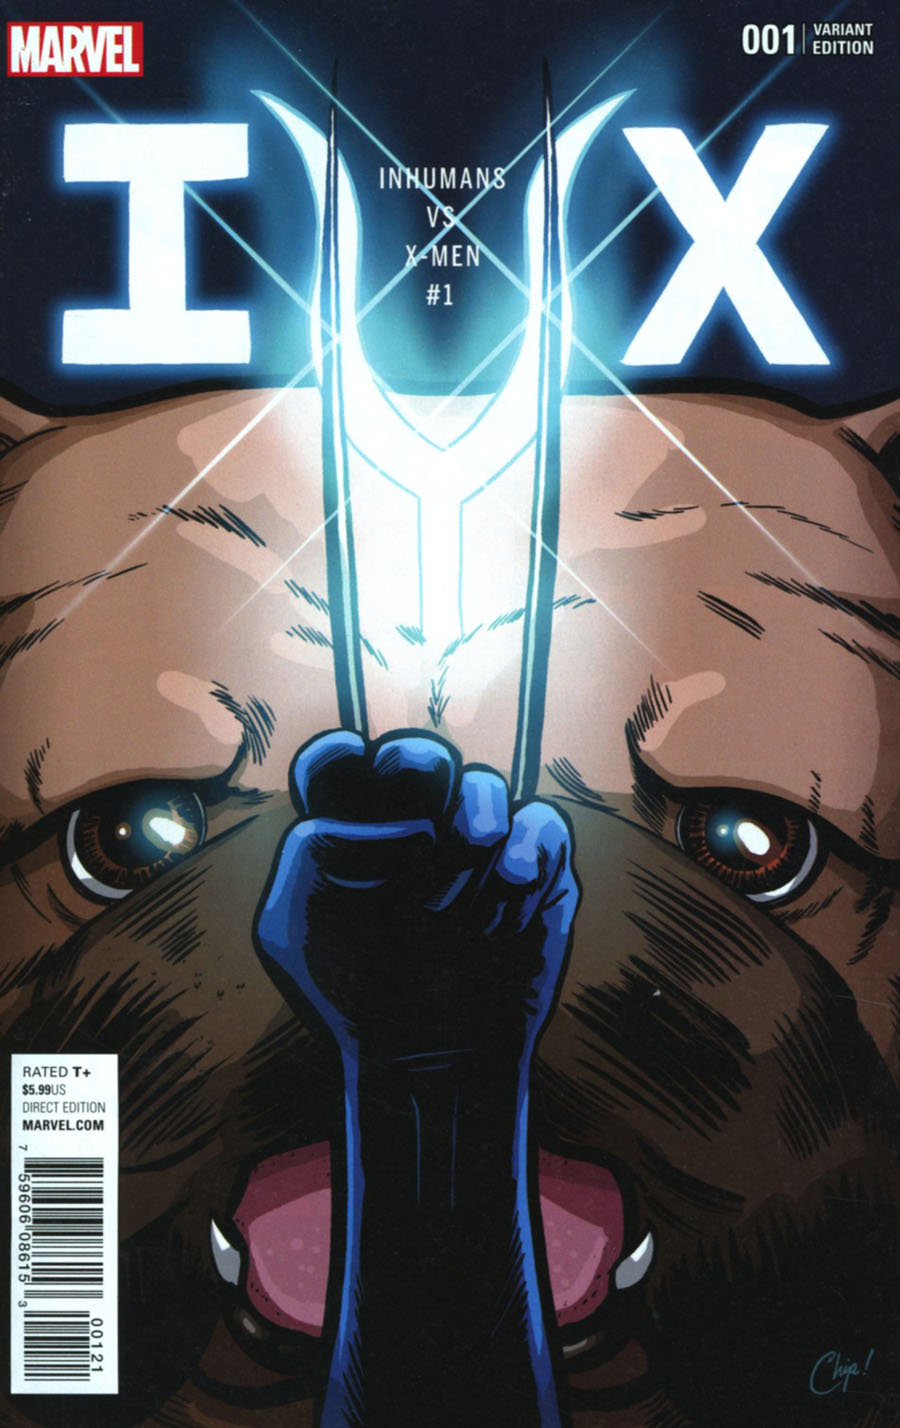 Inhumans vs X-Men #1 Cover E Variant Chip Zdarsky Color Cover